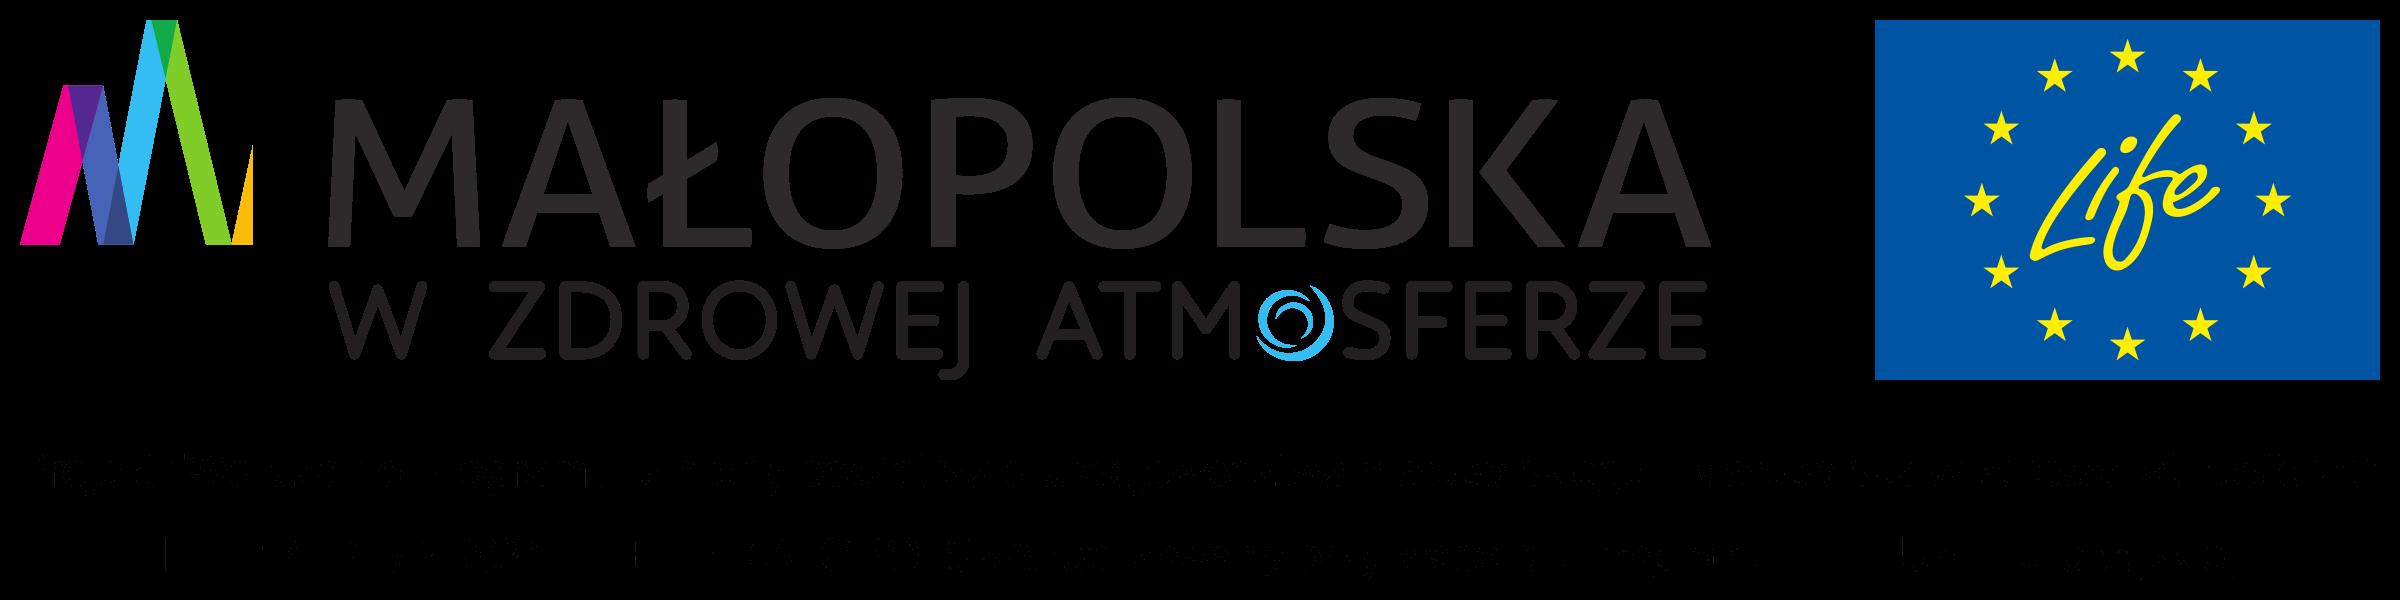 https://powietrze.malopolska.pl/wp-content/uploads/2018/03/LIFE-IP_Malopolska_long.png